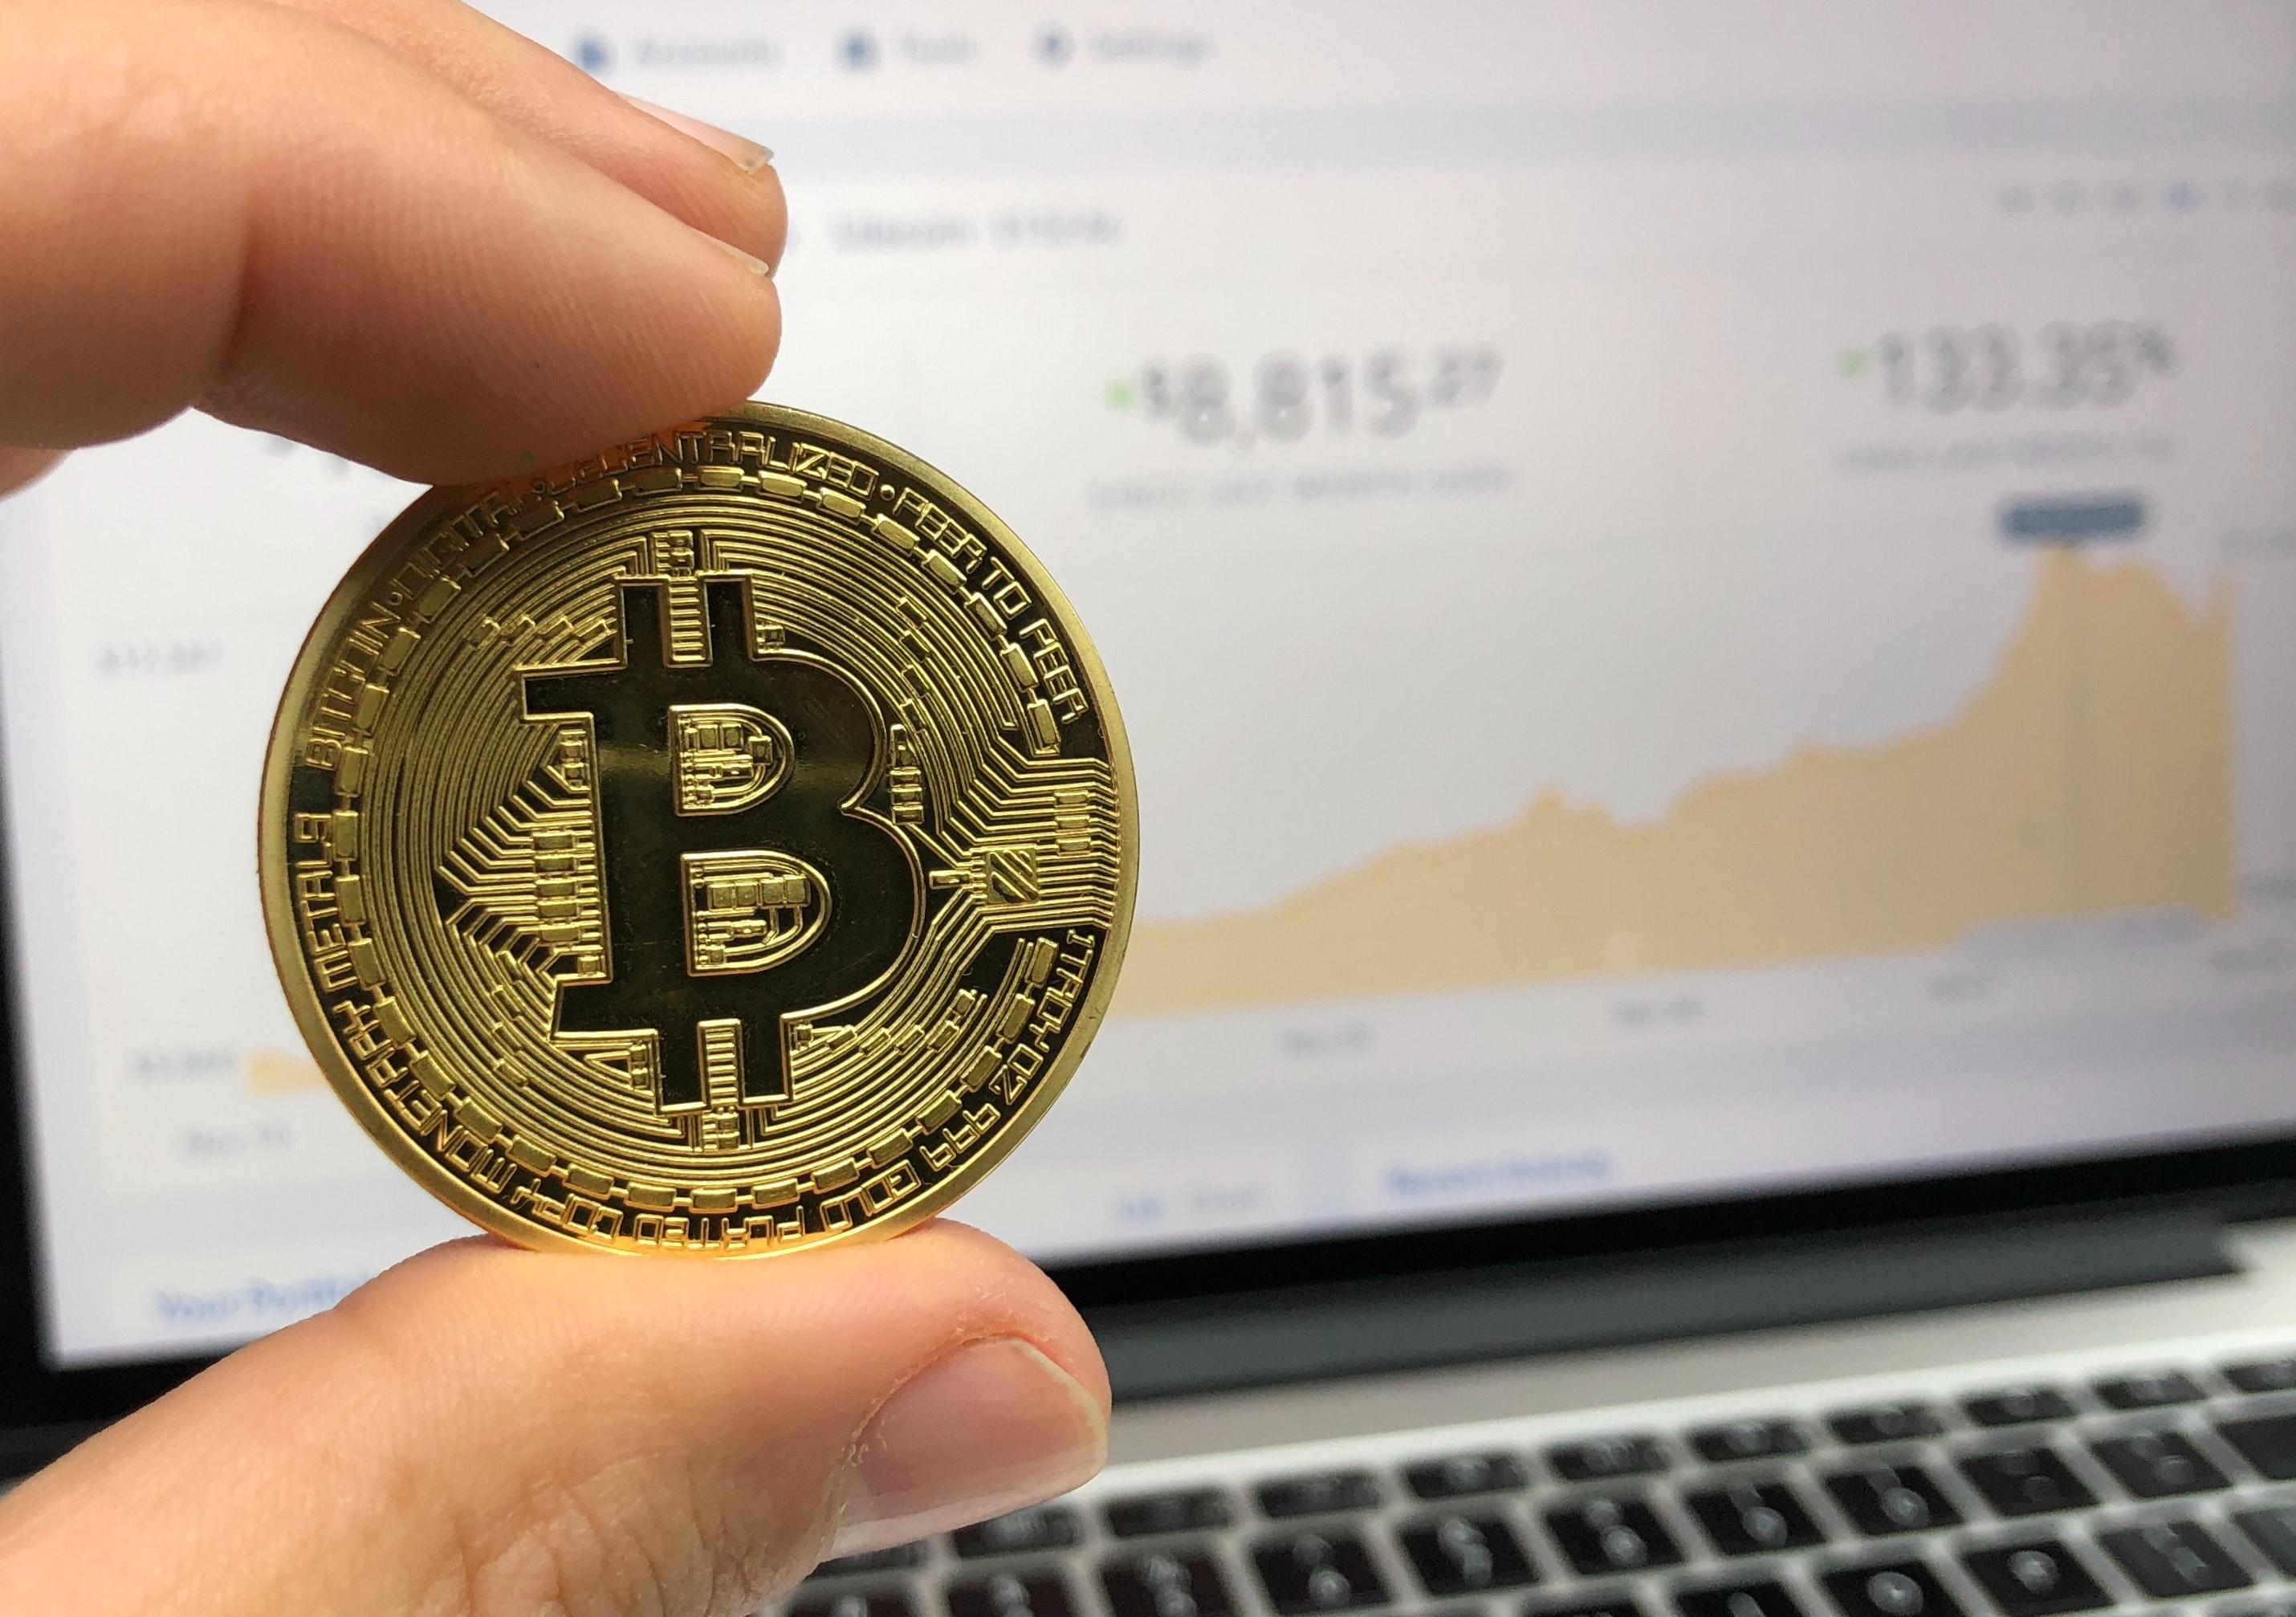 Let the Blockchain take the strain | Digital Leaders